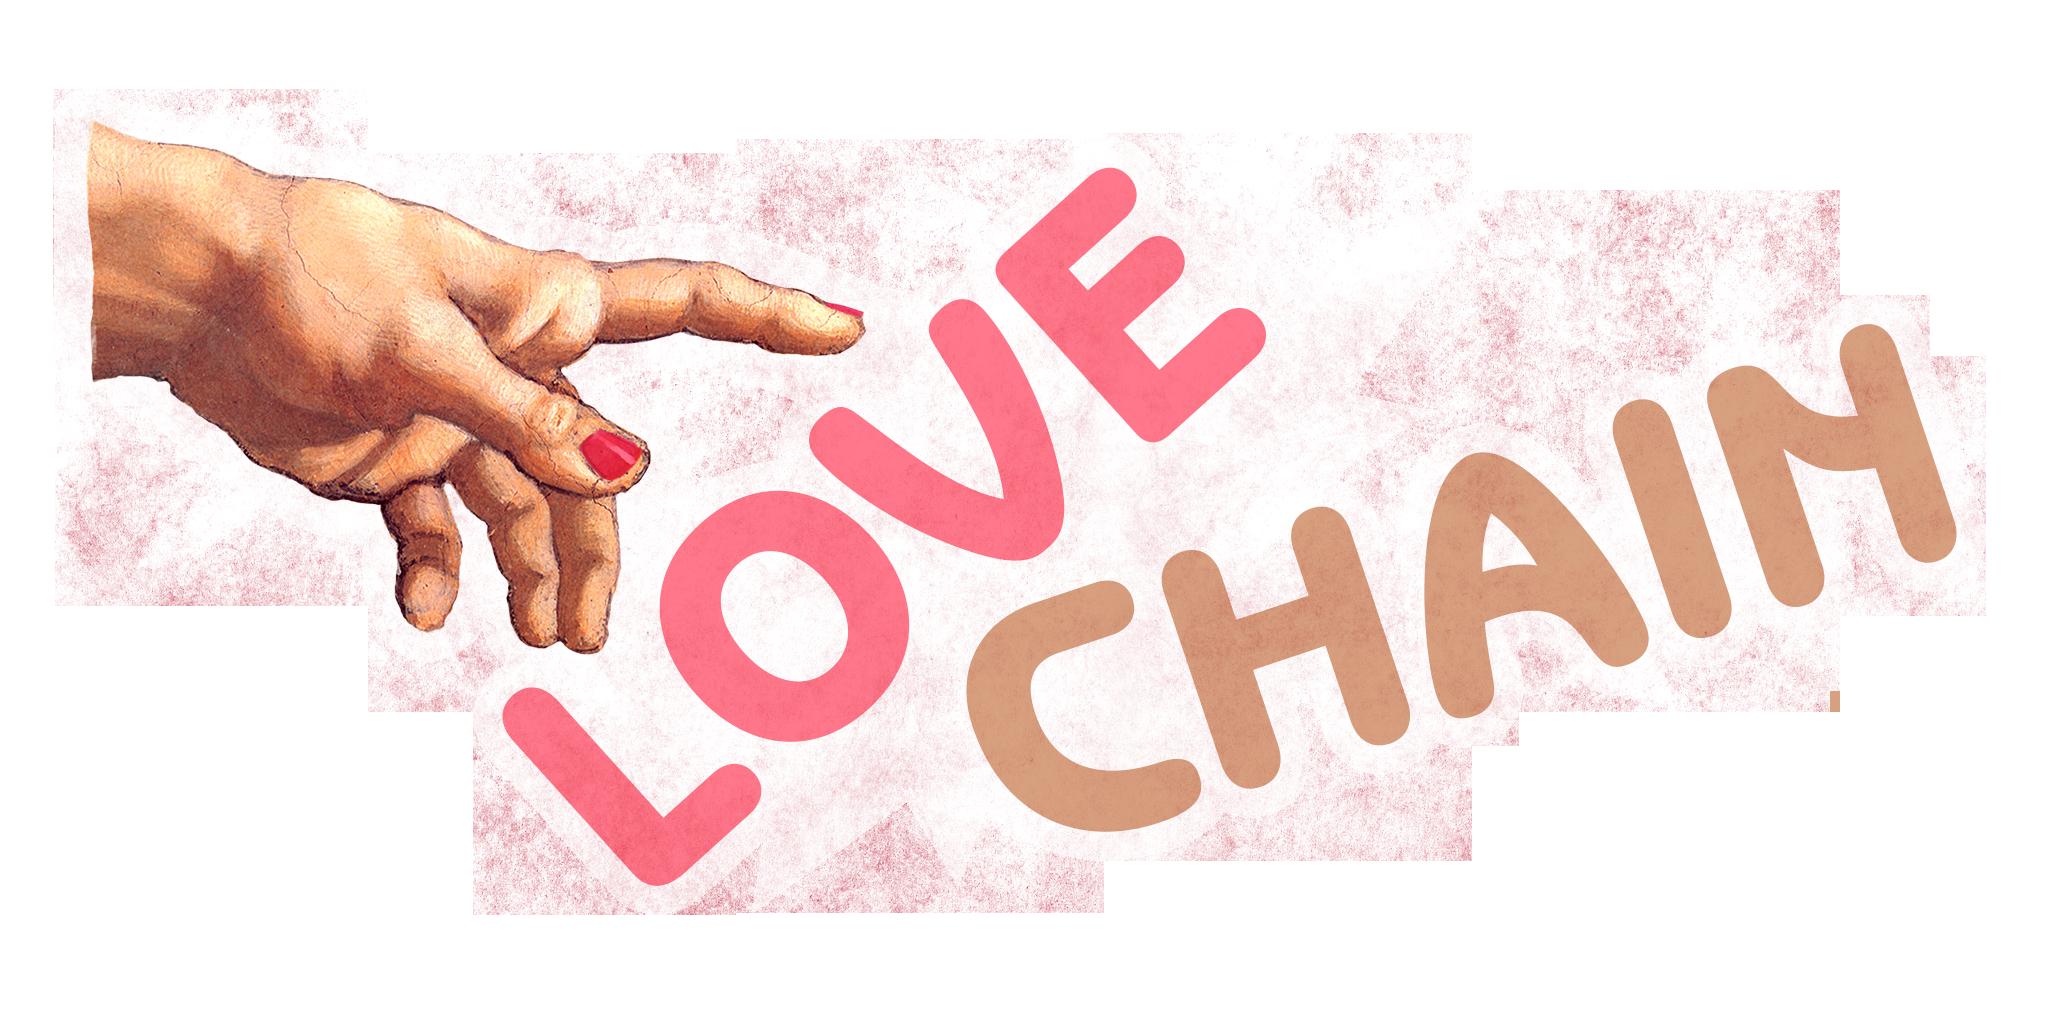 Love Chain